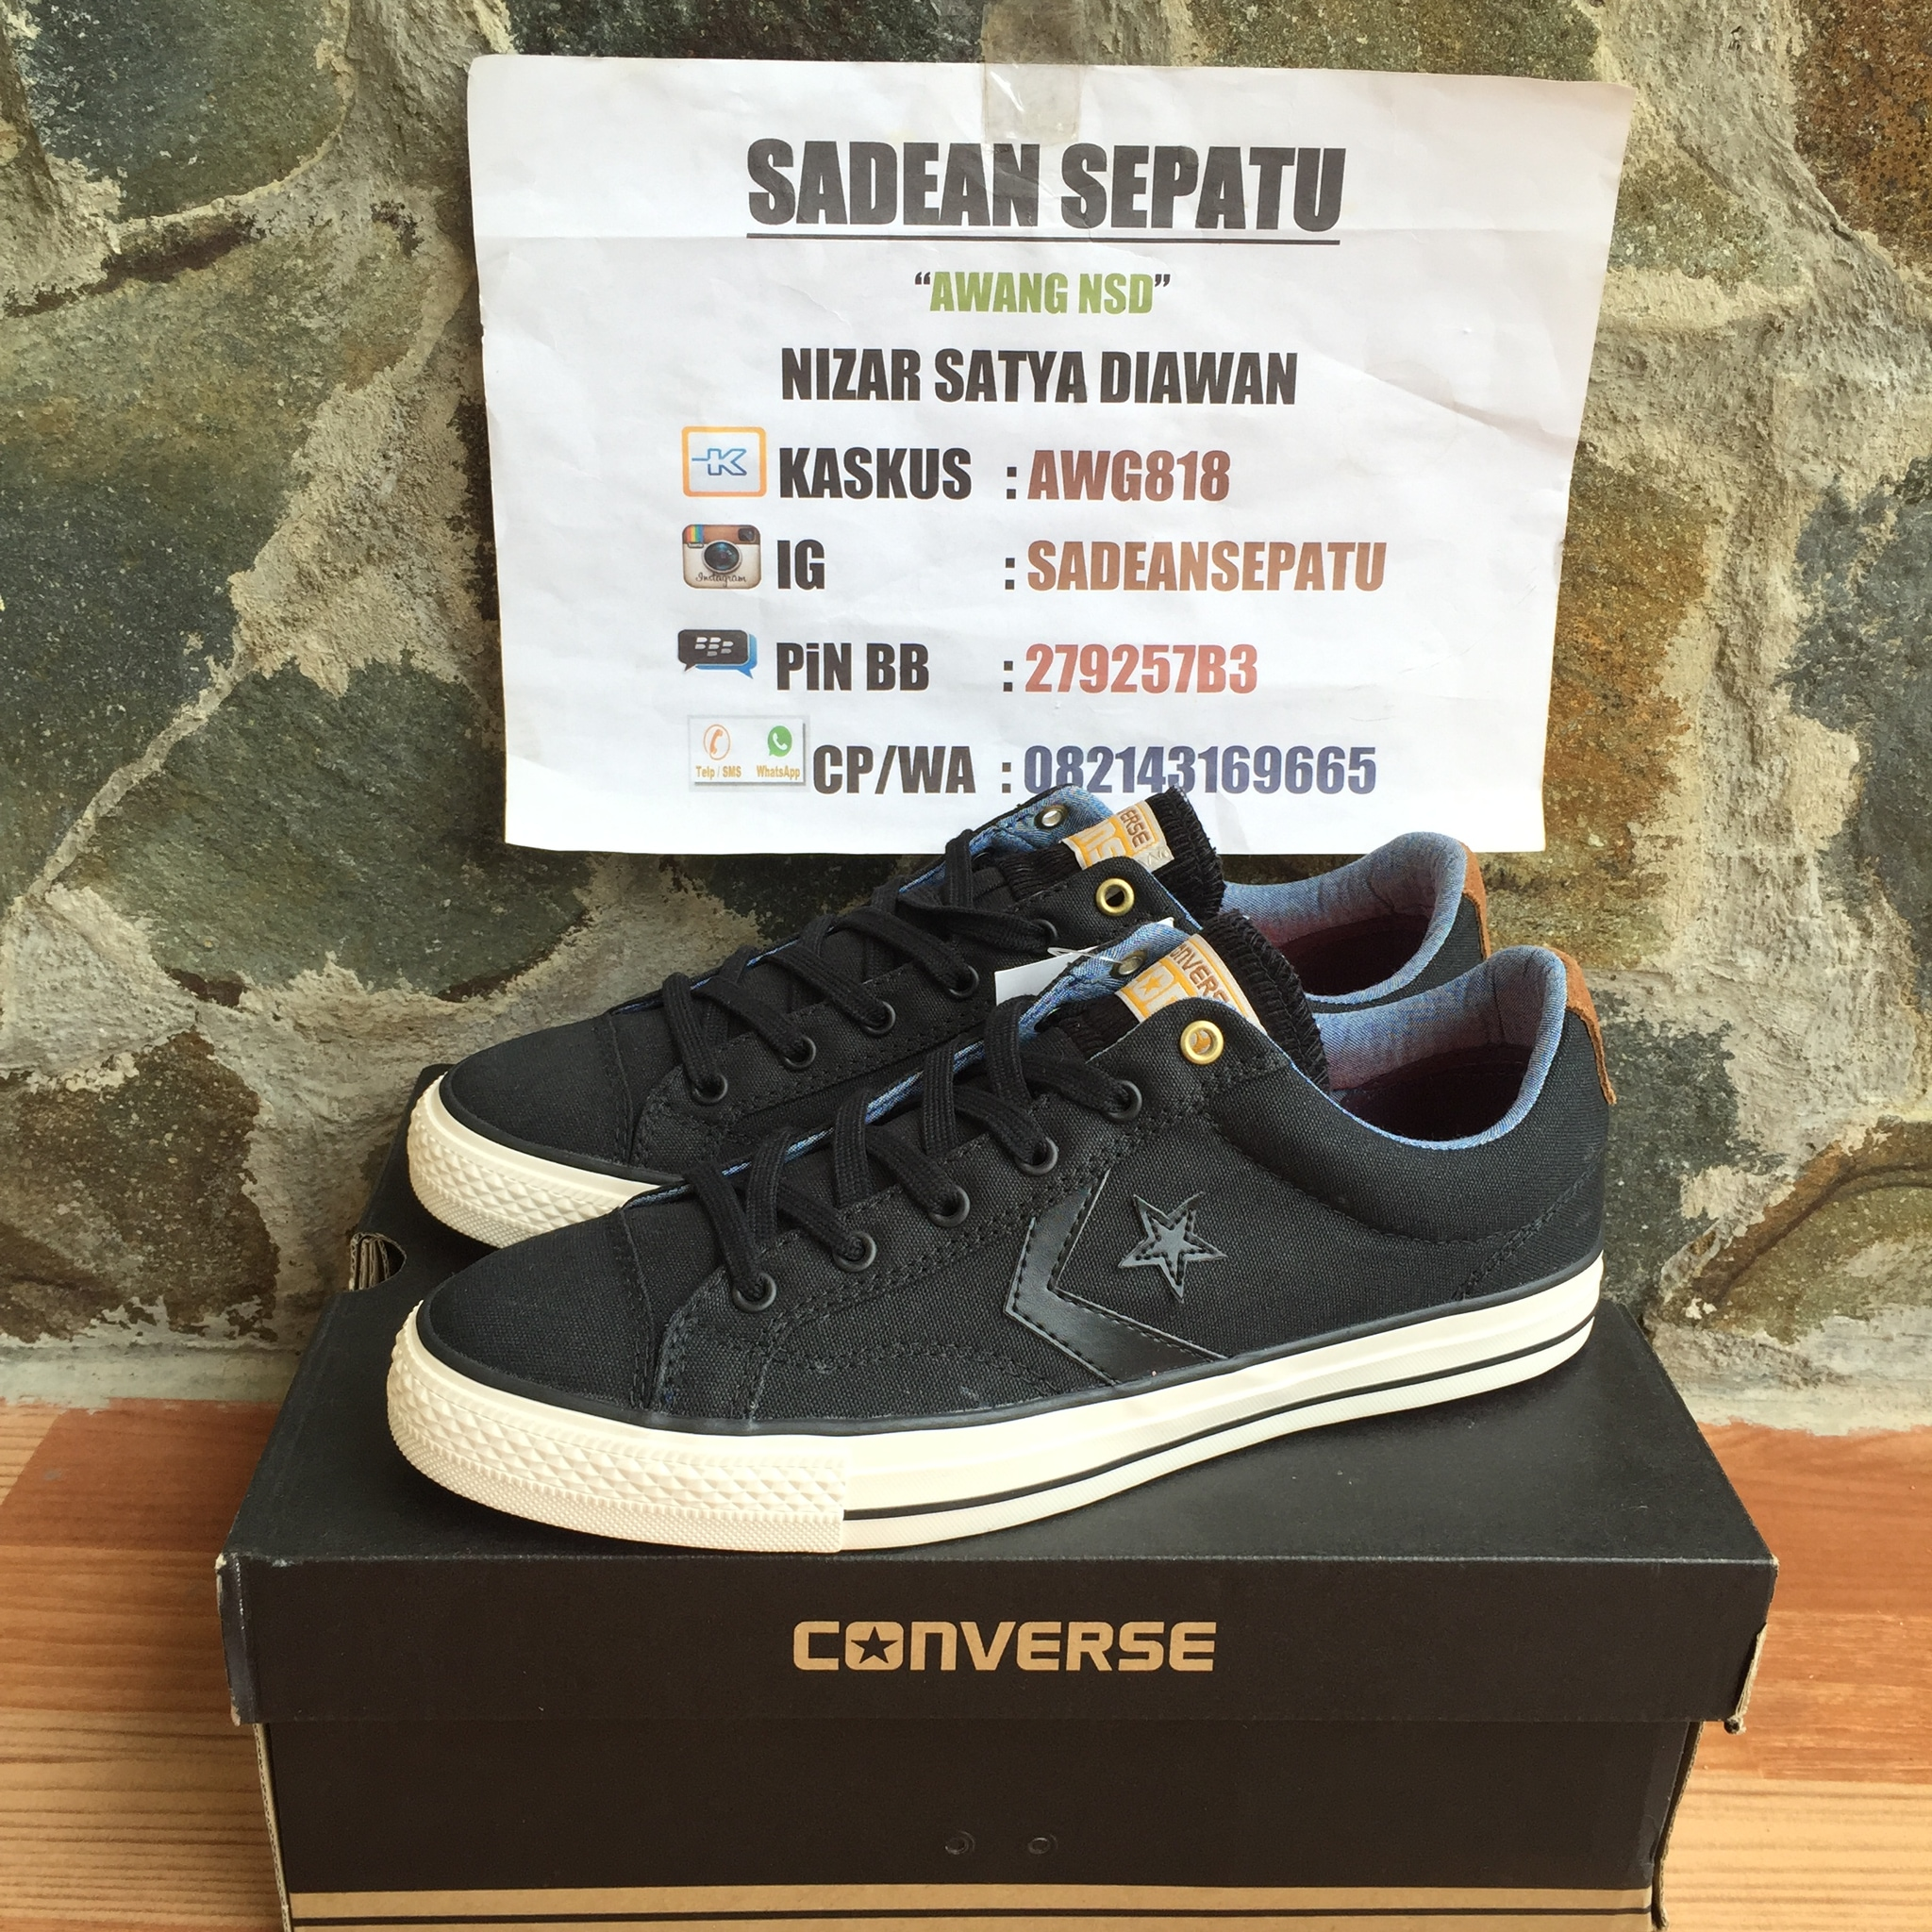 d6524984884 ... good jual converse star player ox black rubber original new sadean  sepatu tokopedia 4d2fe 8453f